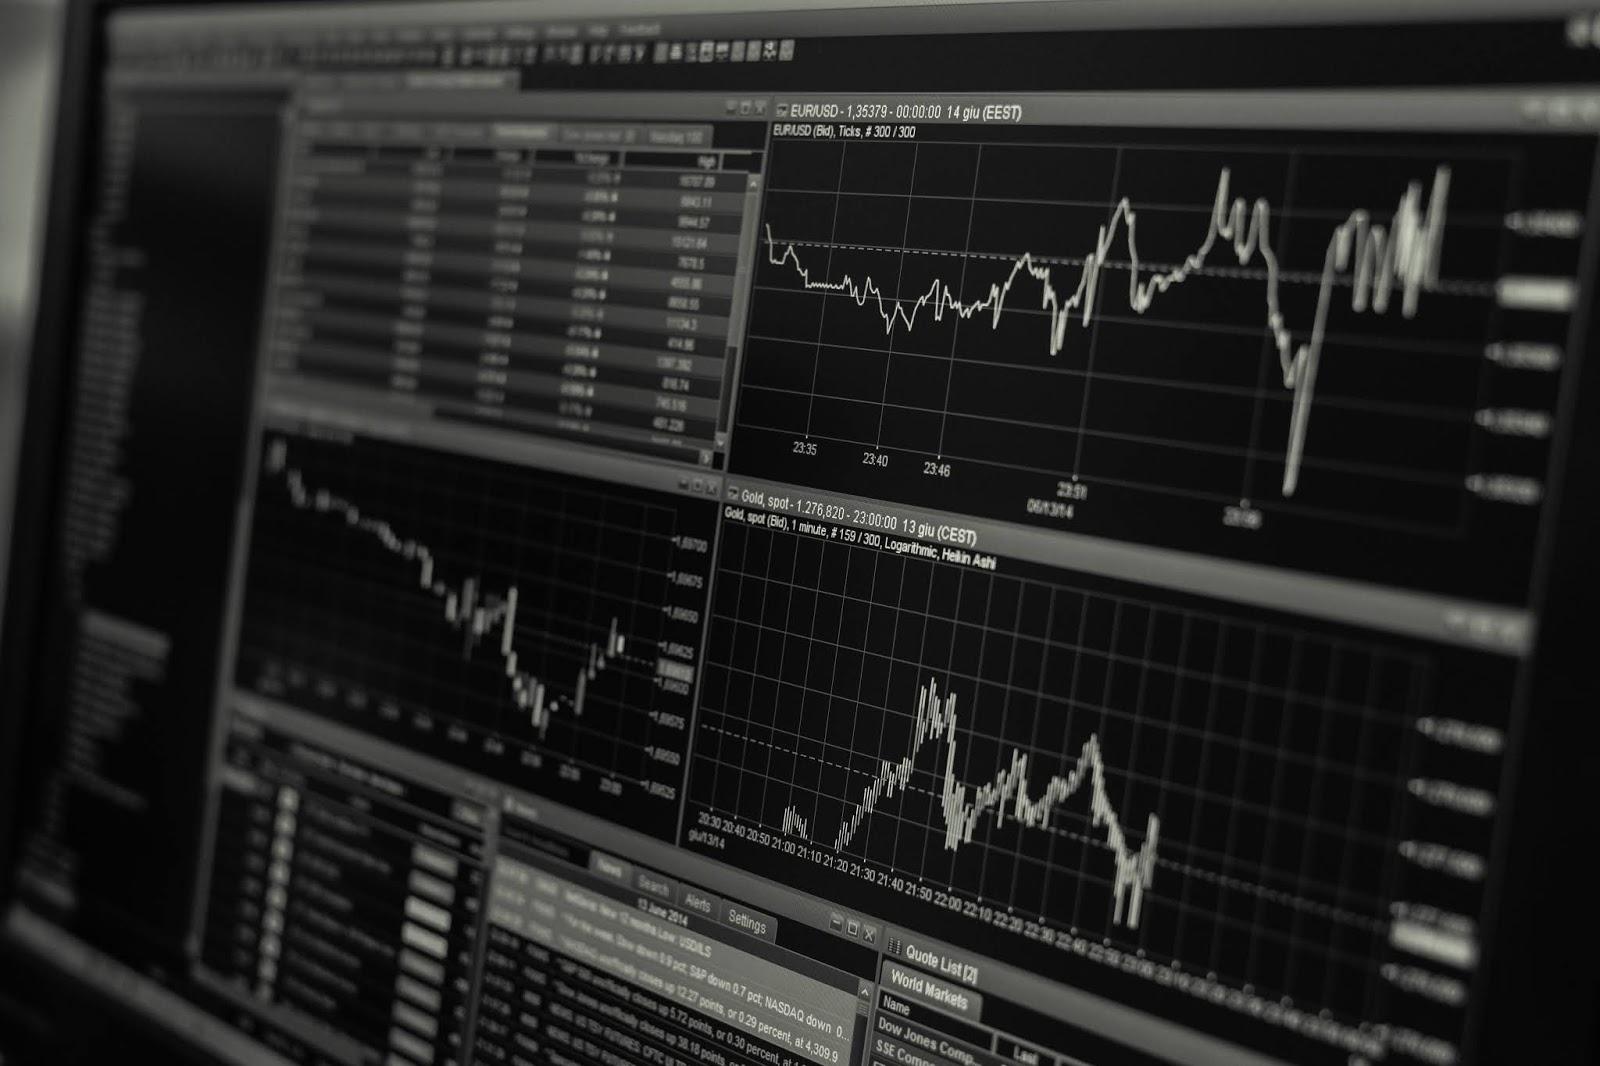 Форекс прогноз основных валютных пар на 7 апреля